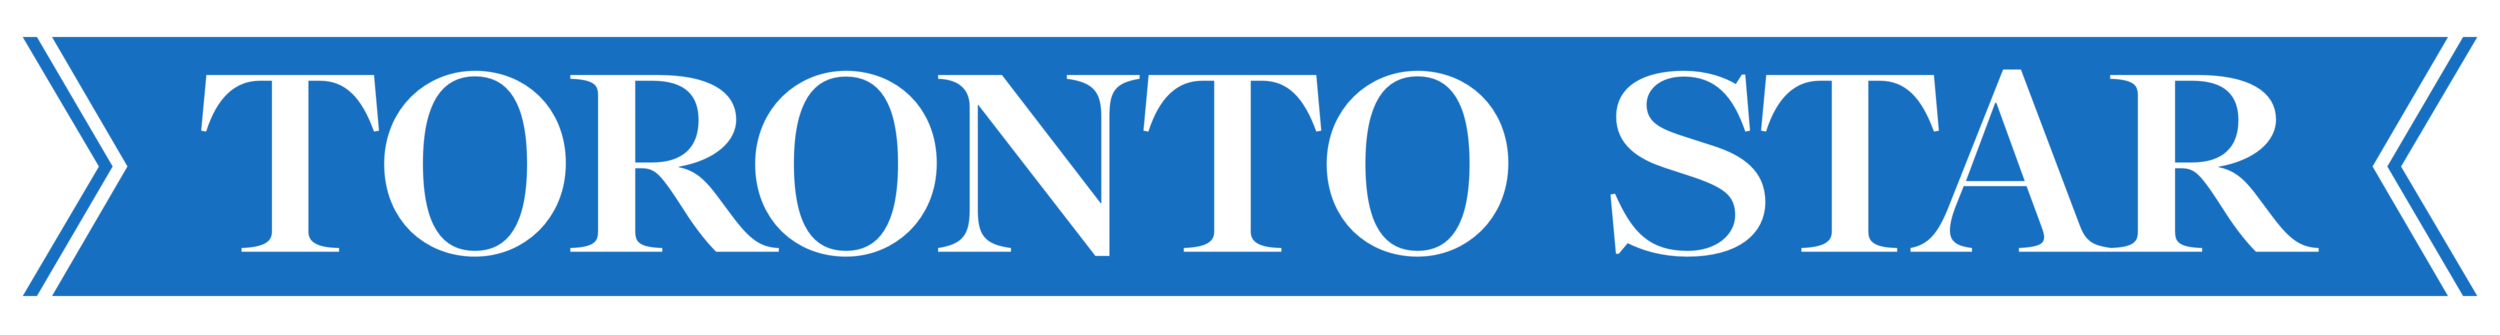 kisspng-toronto-star-newspaper-logo-archaic-5ada651668e367.0040661315242621664296.png